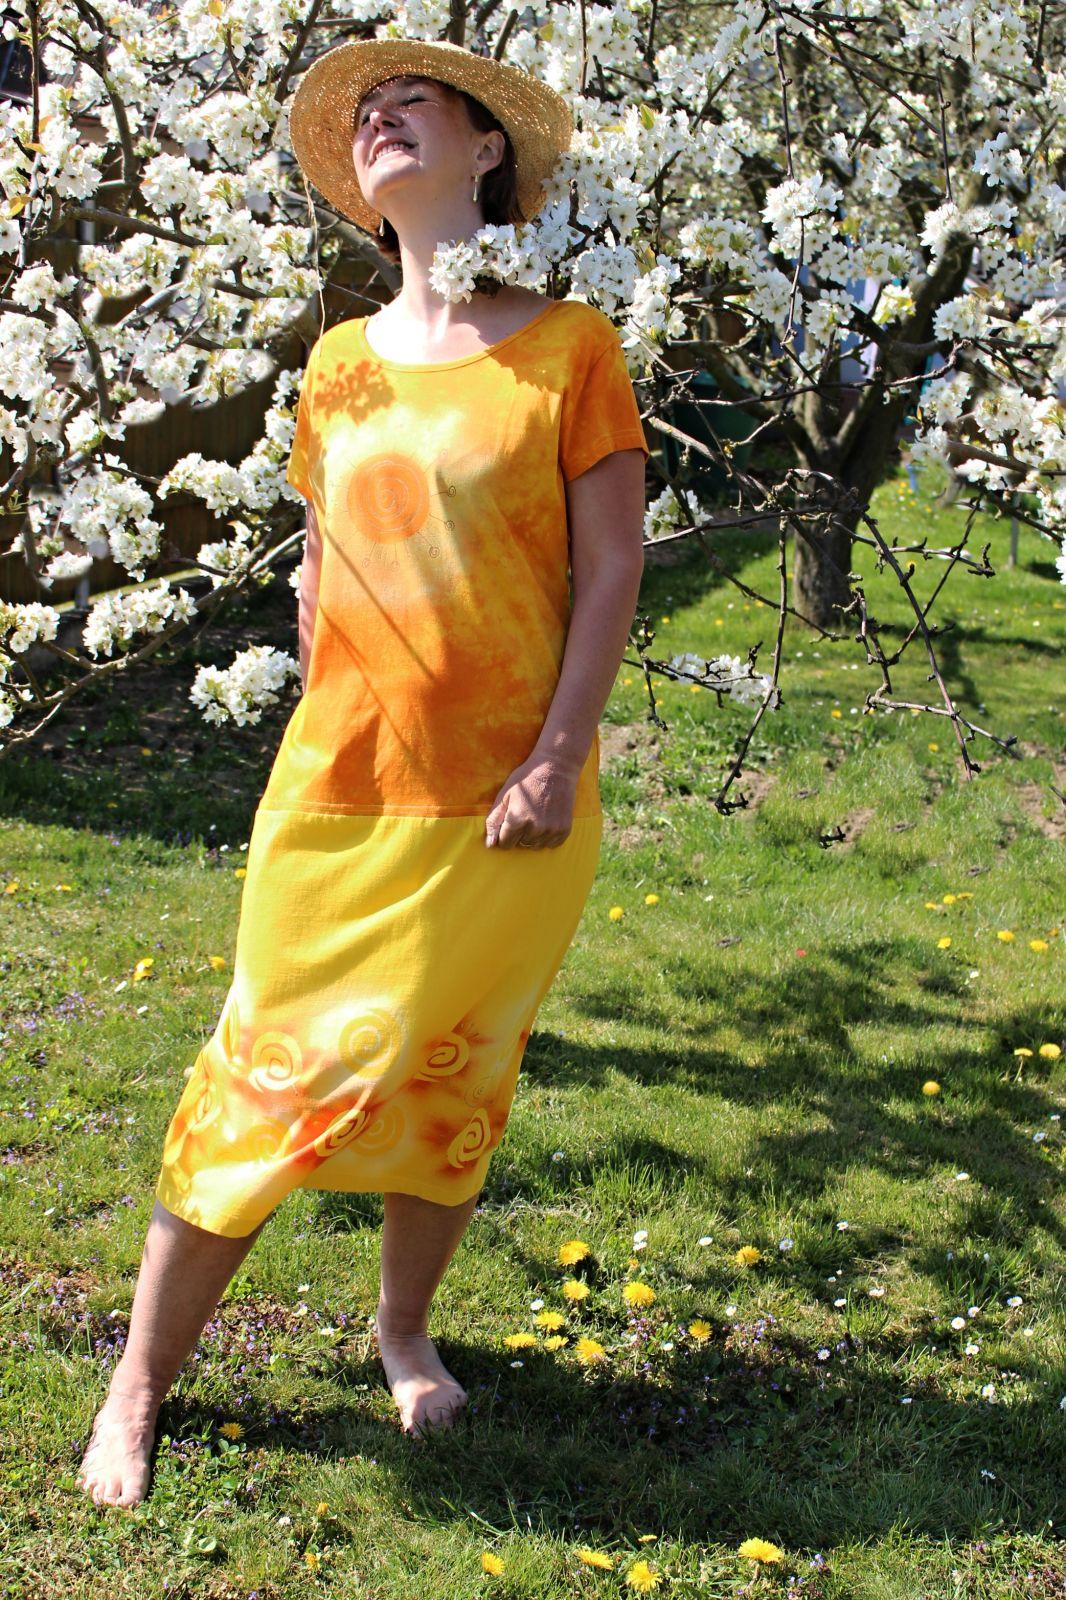 Malované batikované šáty - Lážo plážo, z autorské dílny z Olomouce Batitex - malovaná, batikovaná trička, šaty, mikiny, šátky, šály, kravaty